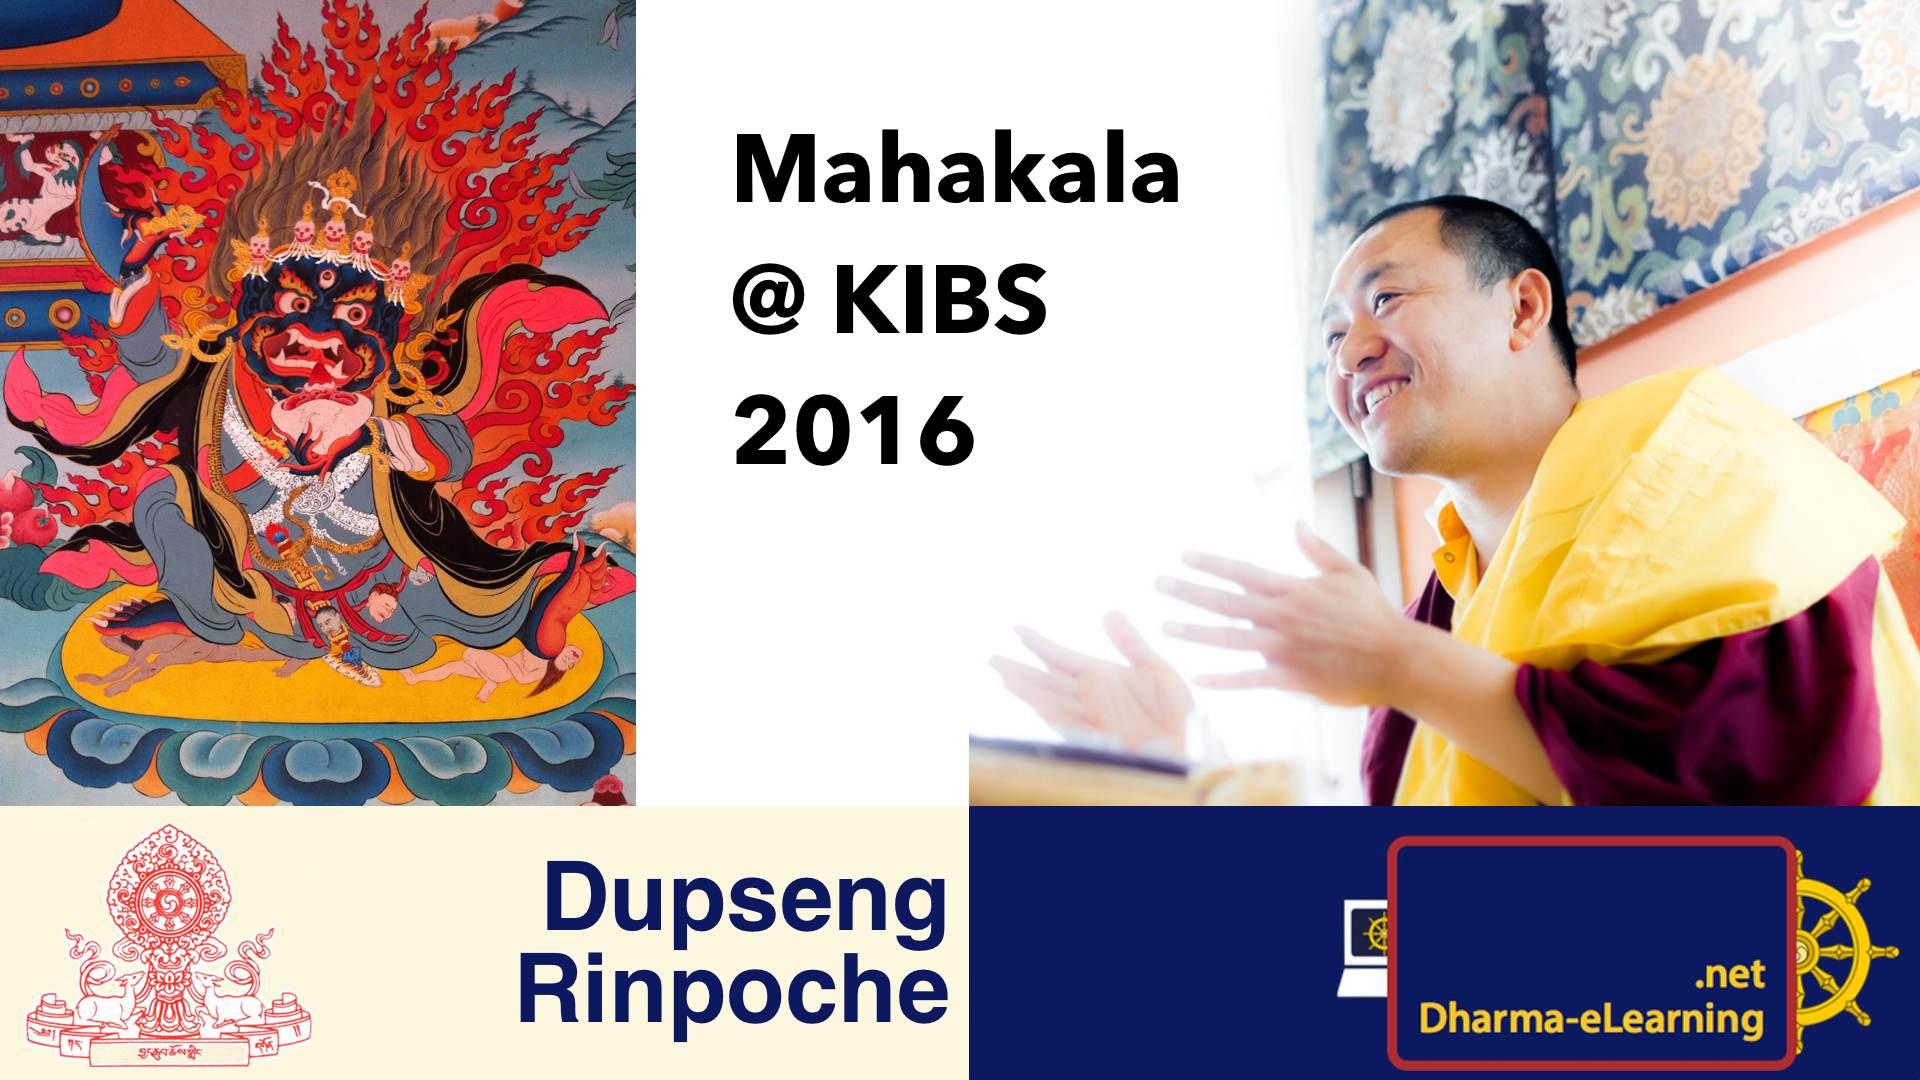 Mahakala Retreat Teachings with Dupseng Rinpoche